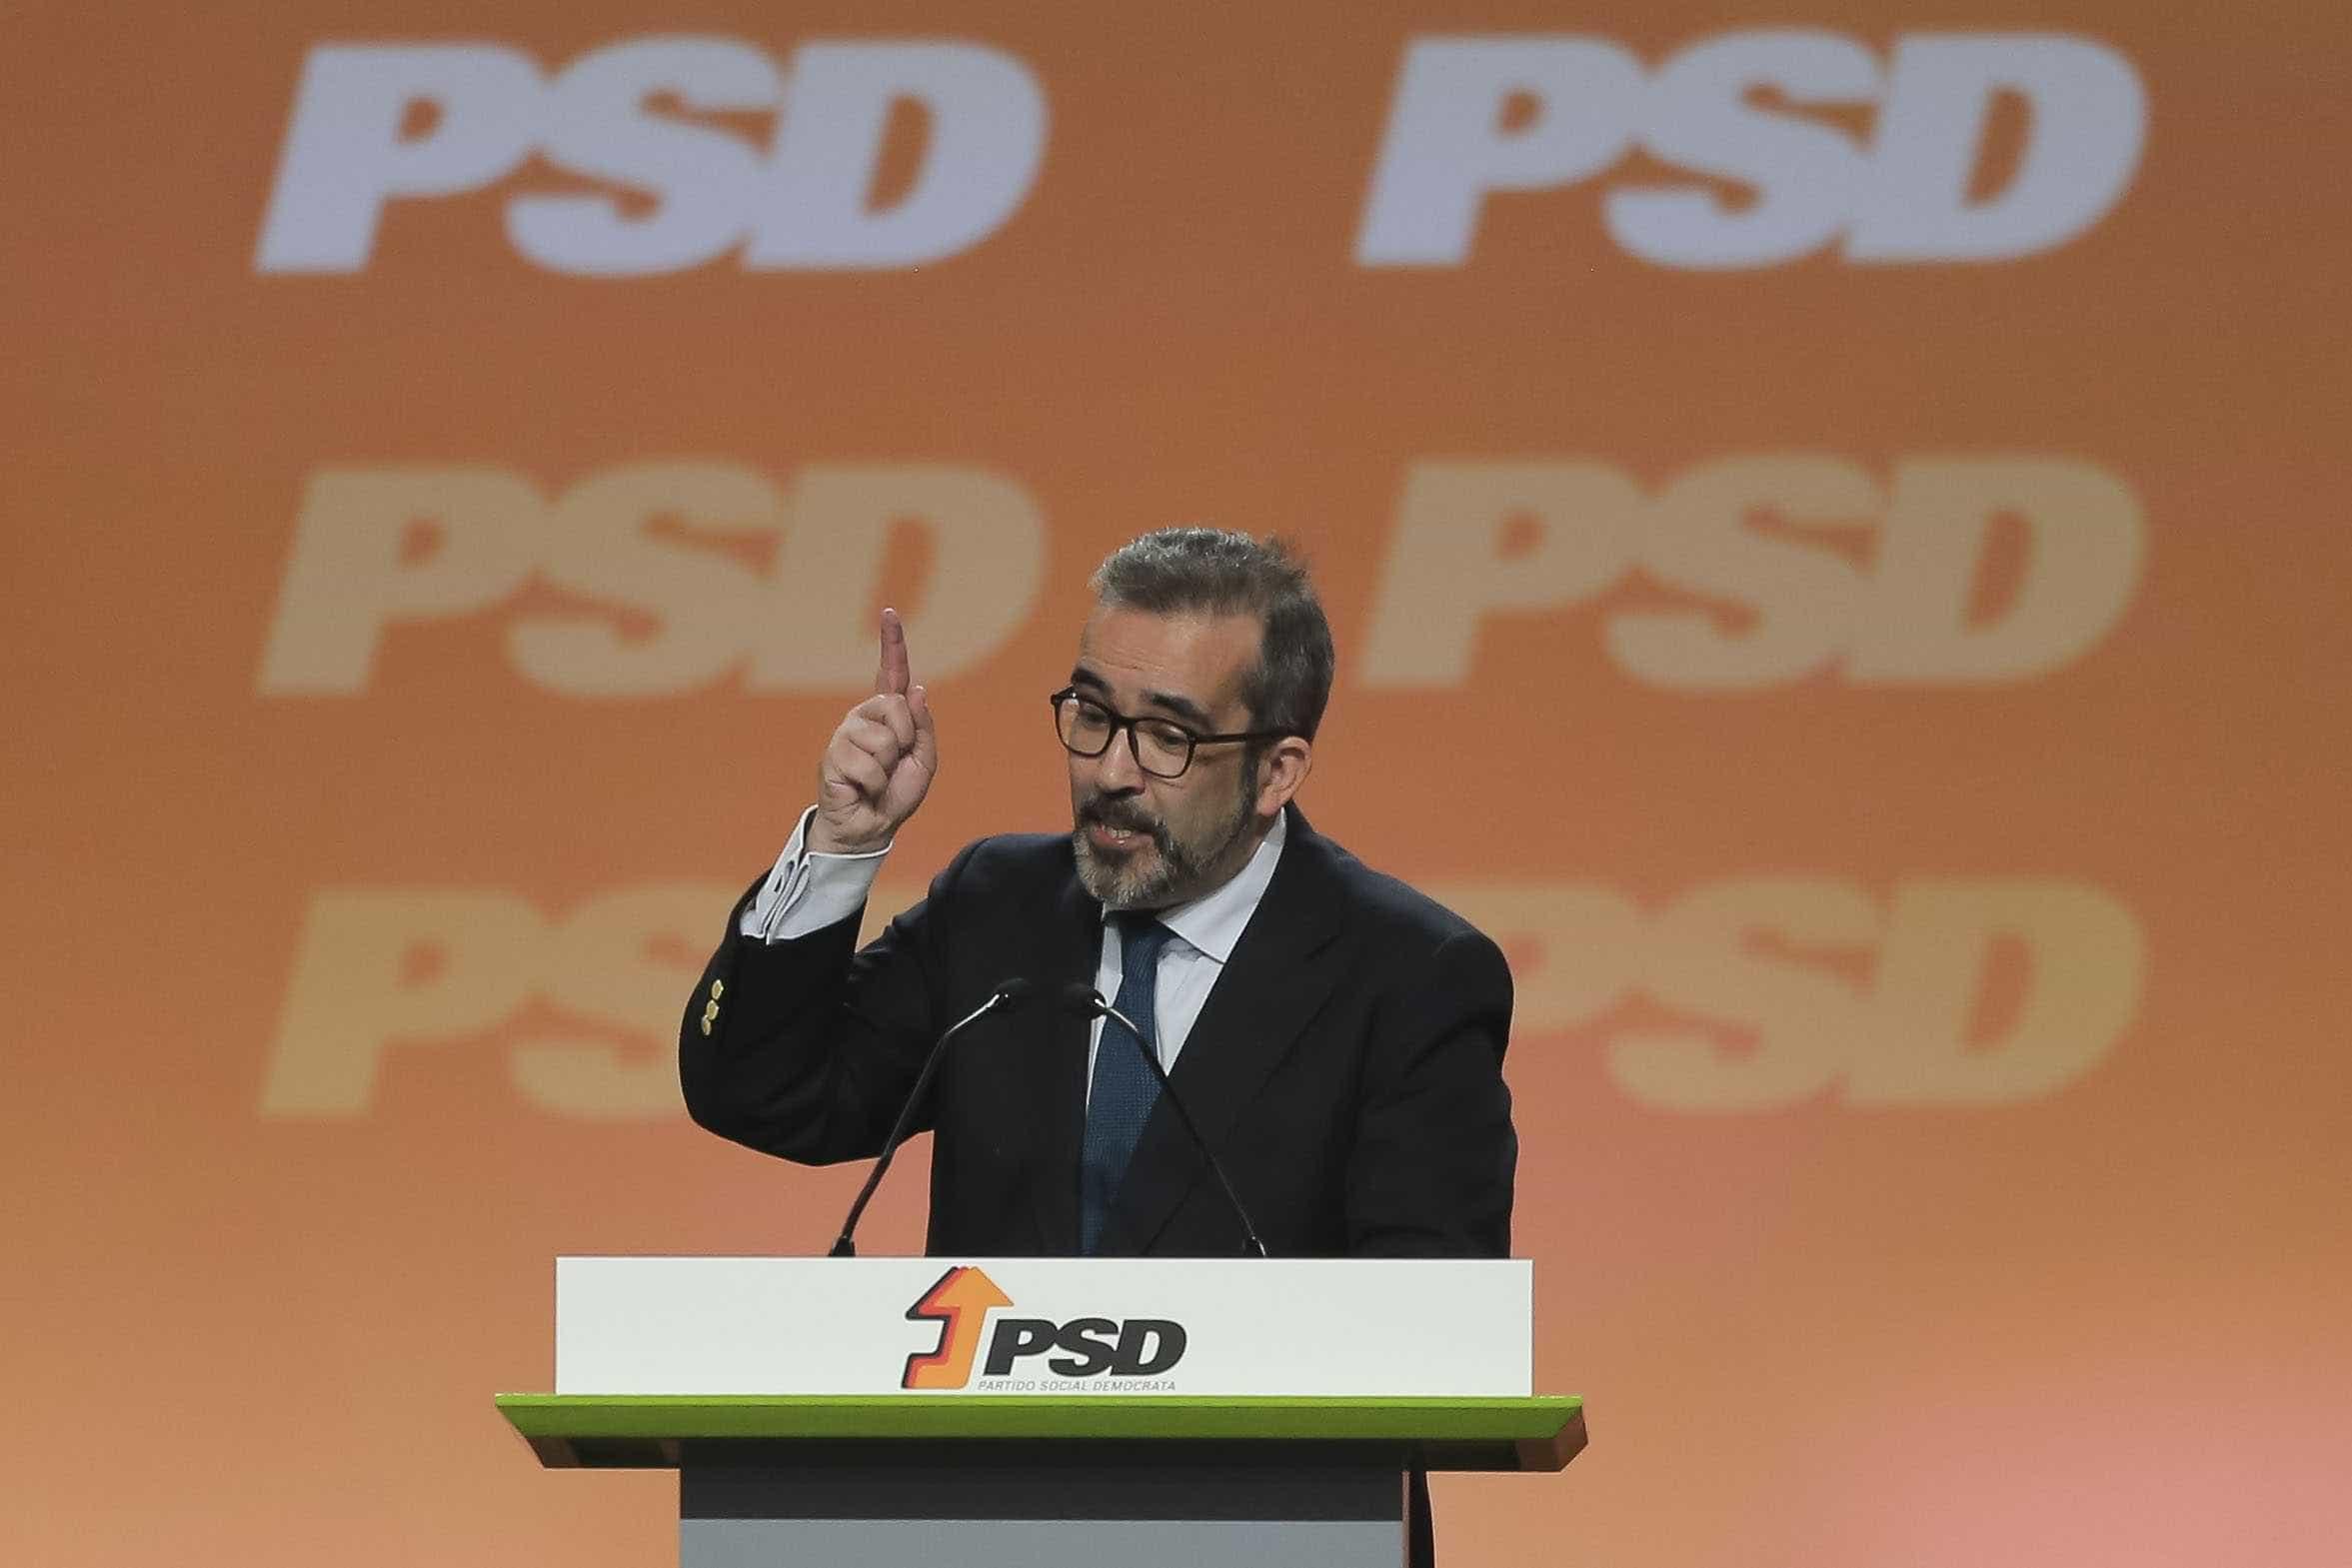 Rio, Moedas, Rangel e presidente do PPE na Universidade Europa do PSD